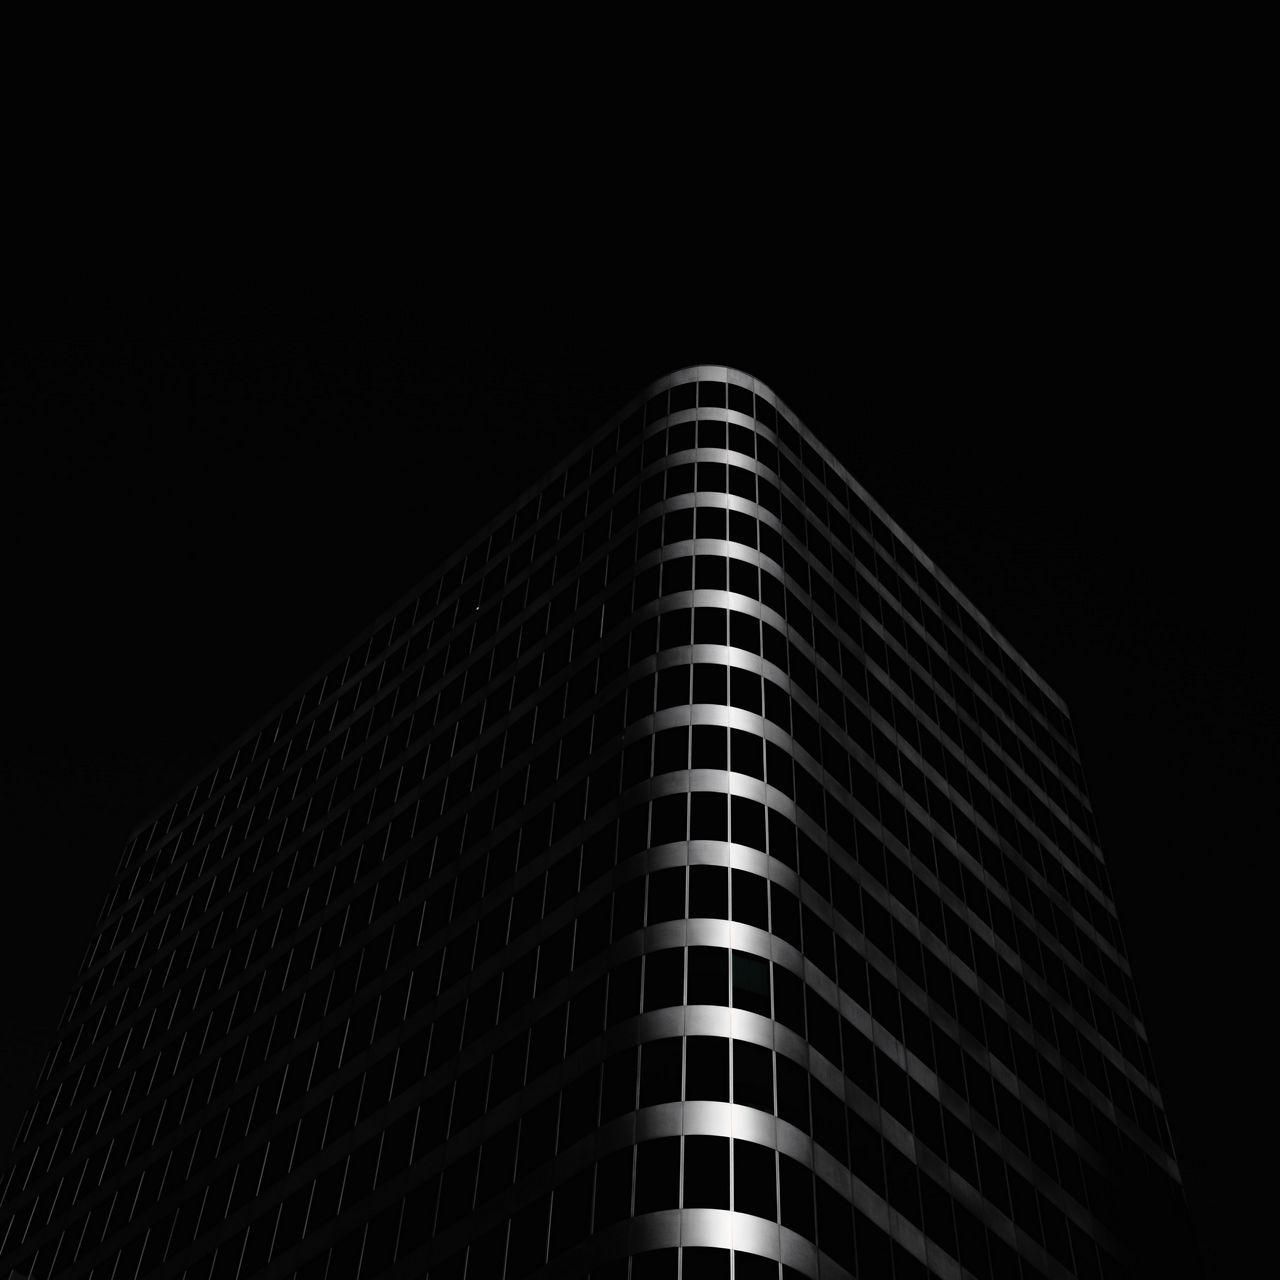 1280x1280 Wallpaper building, architecture, black, dark